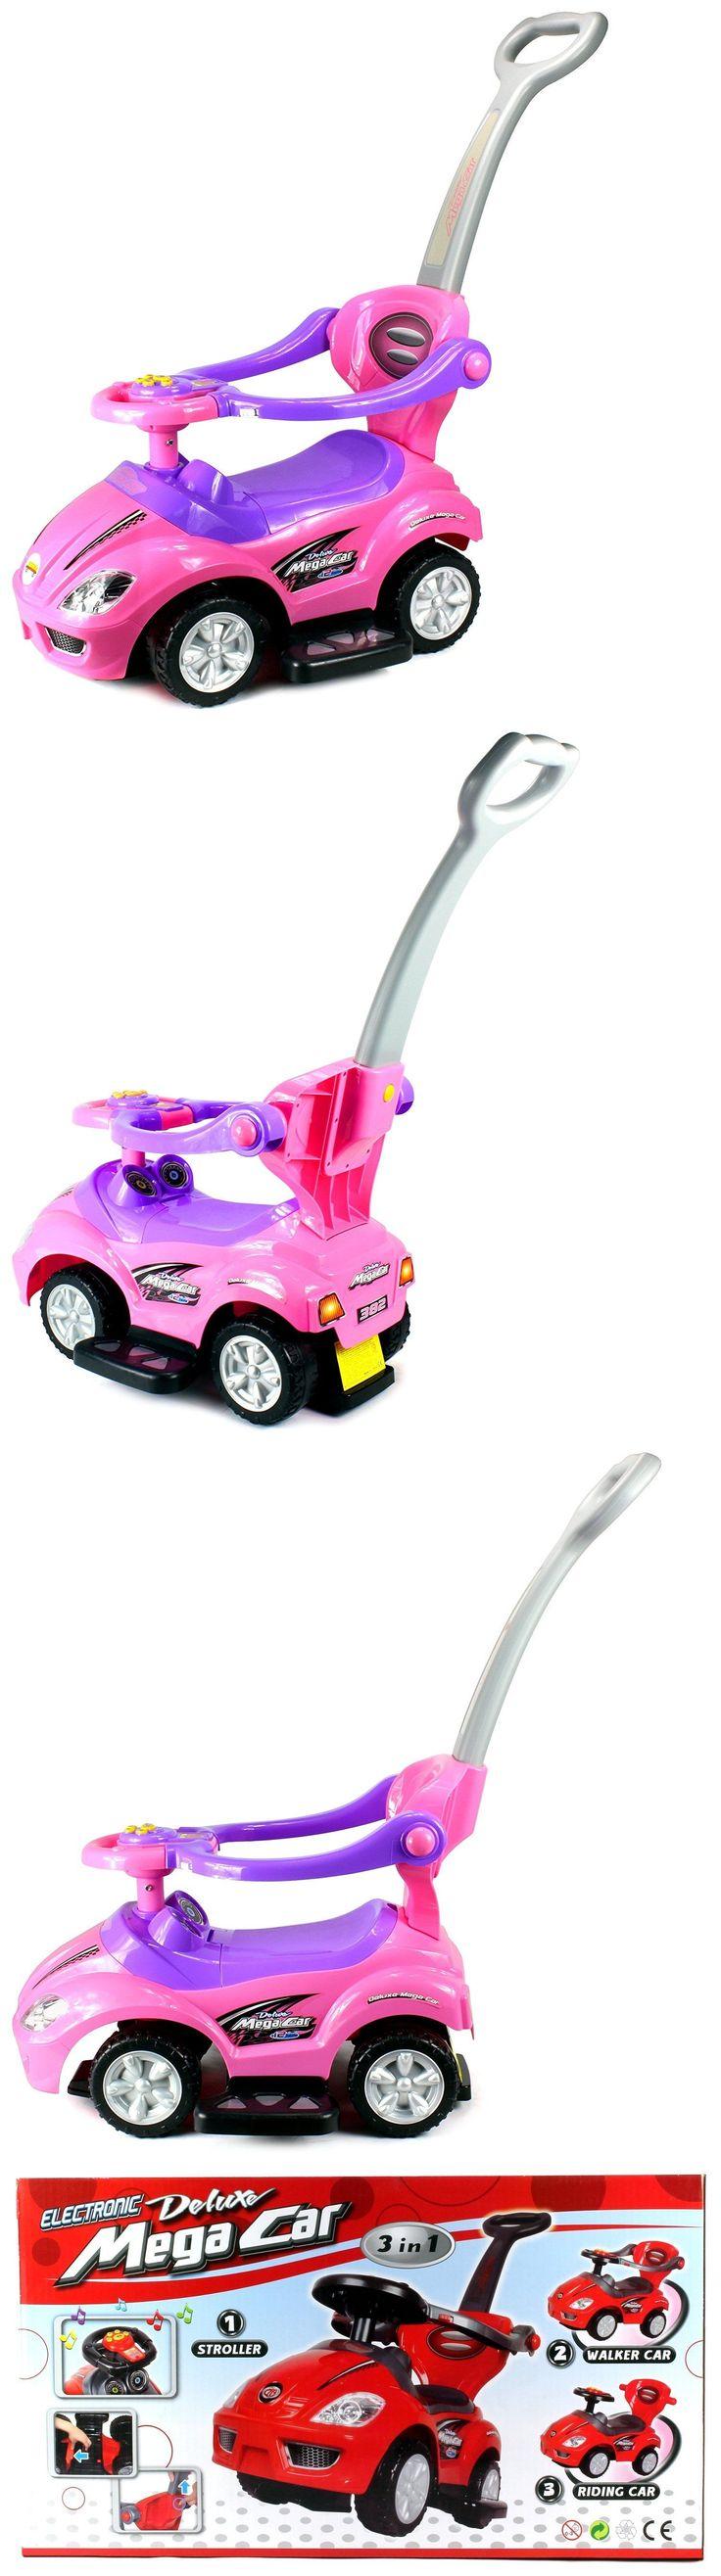 Walkers Deluxe Mega 3 In 1 Car Children S Toy Stroller And Walker Pink